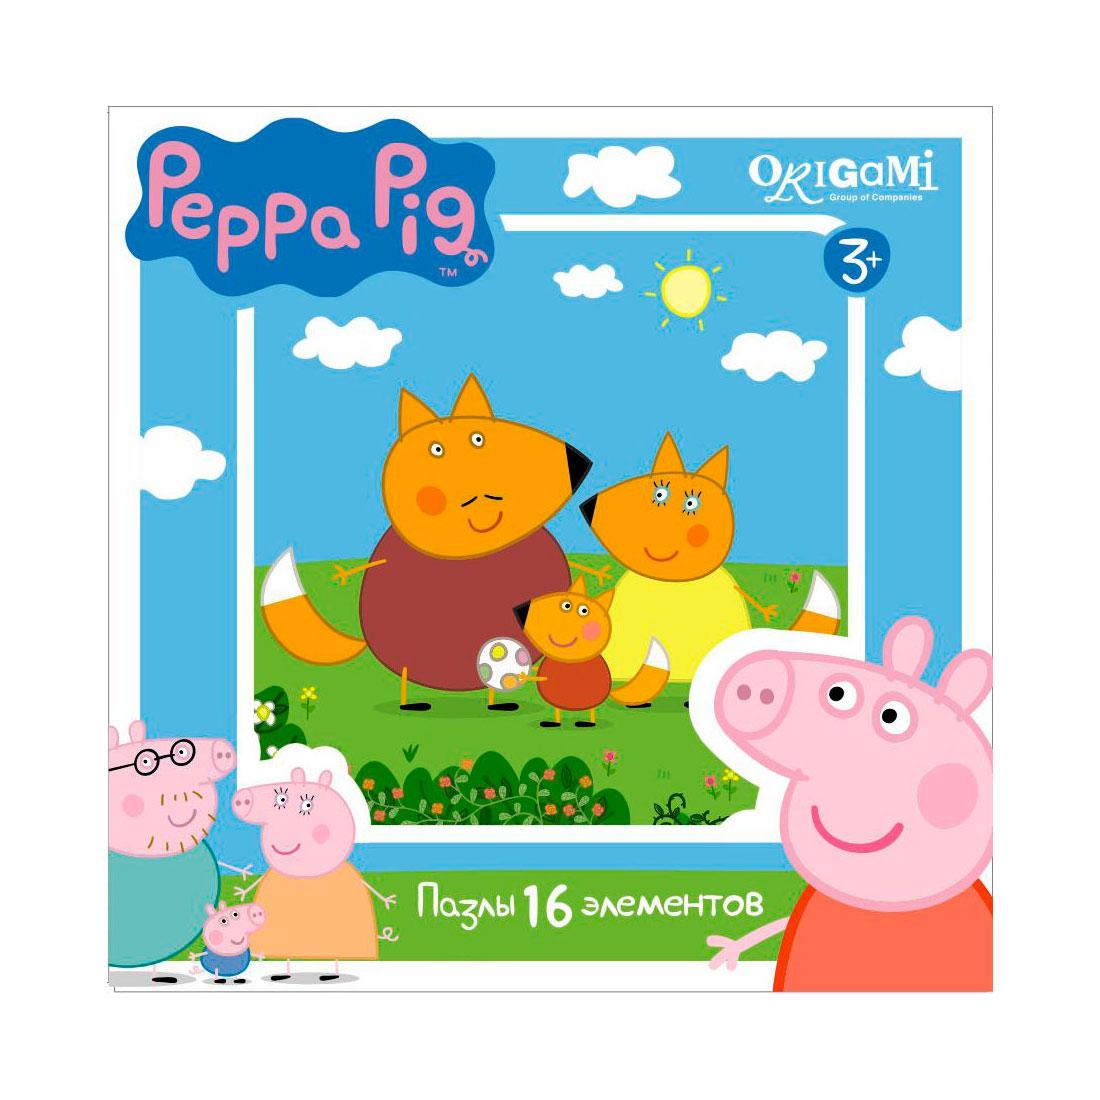 Пазл Origami Peppa Pig 1579<br>